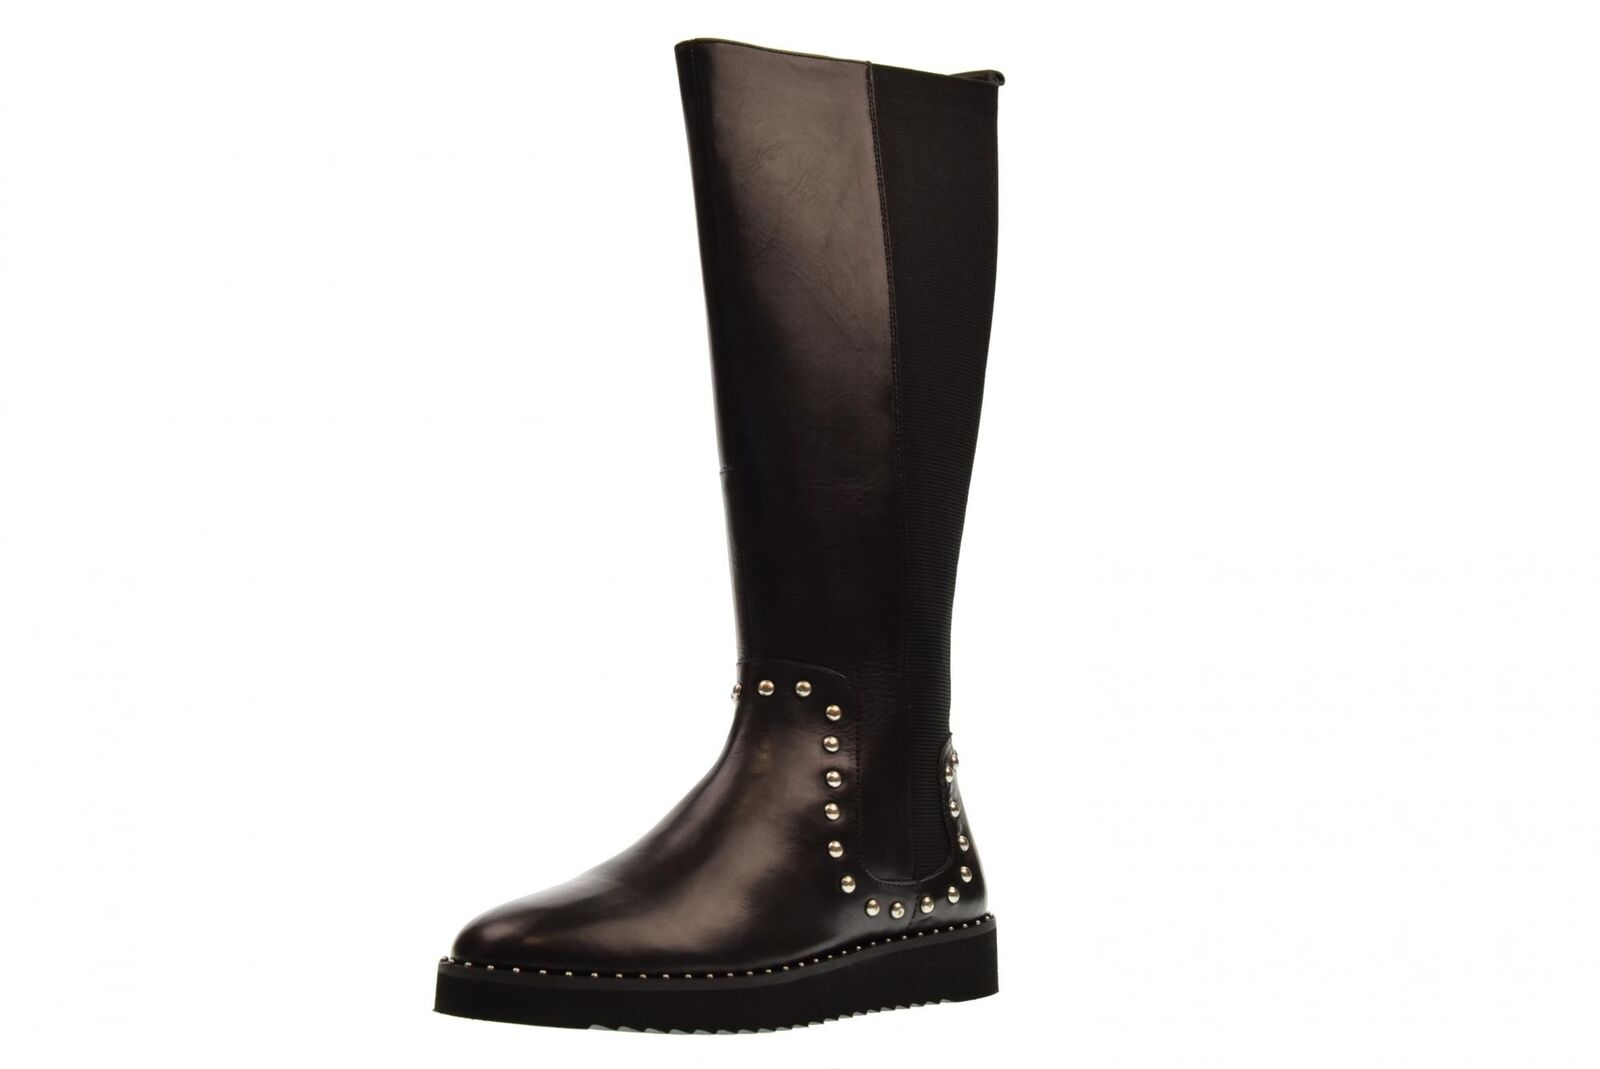 Apepazza Frauenstiefel A18g Schuhe Frauenstiefel Apepazza PTN08 / VITELLO PHILOMENE fd61ed